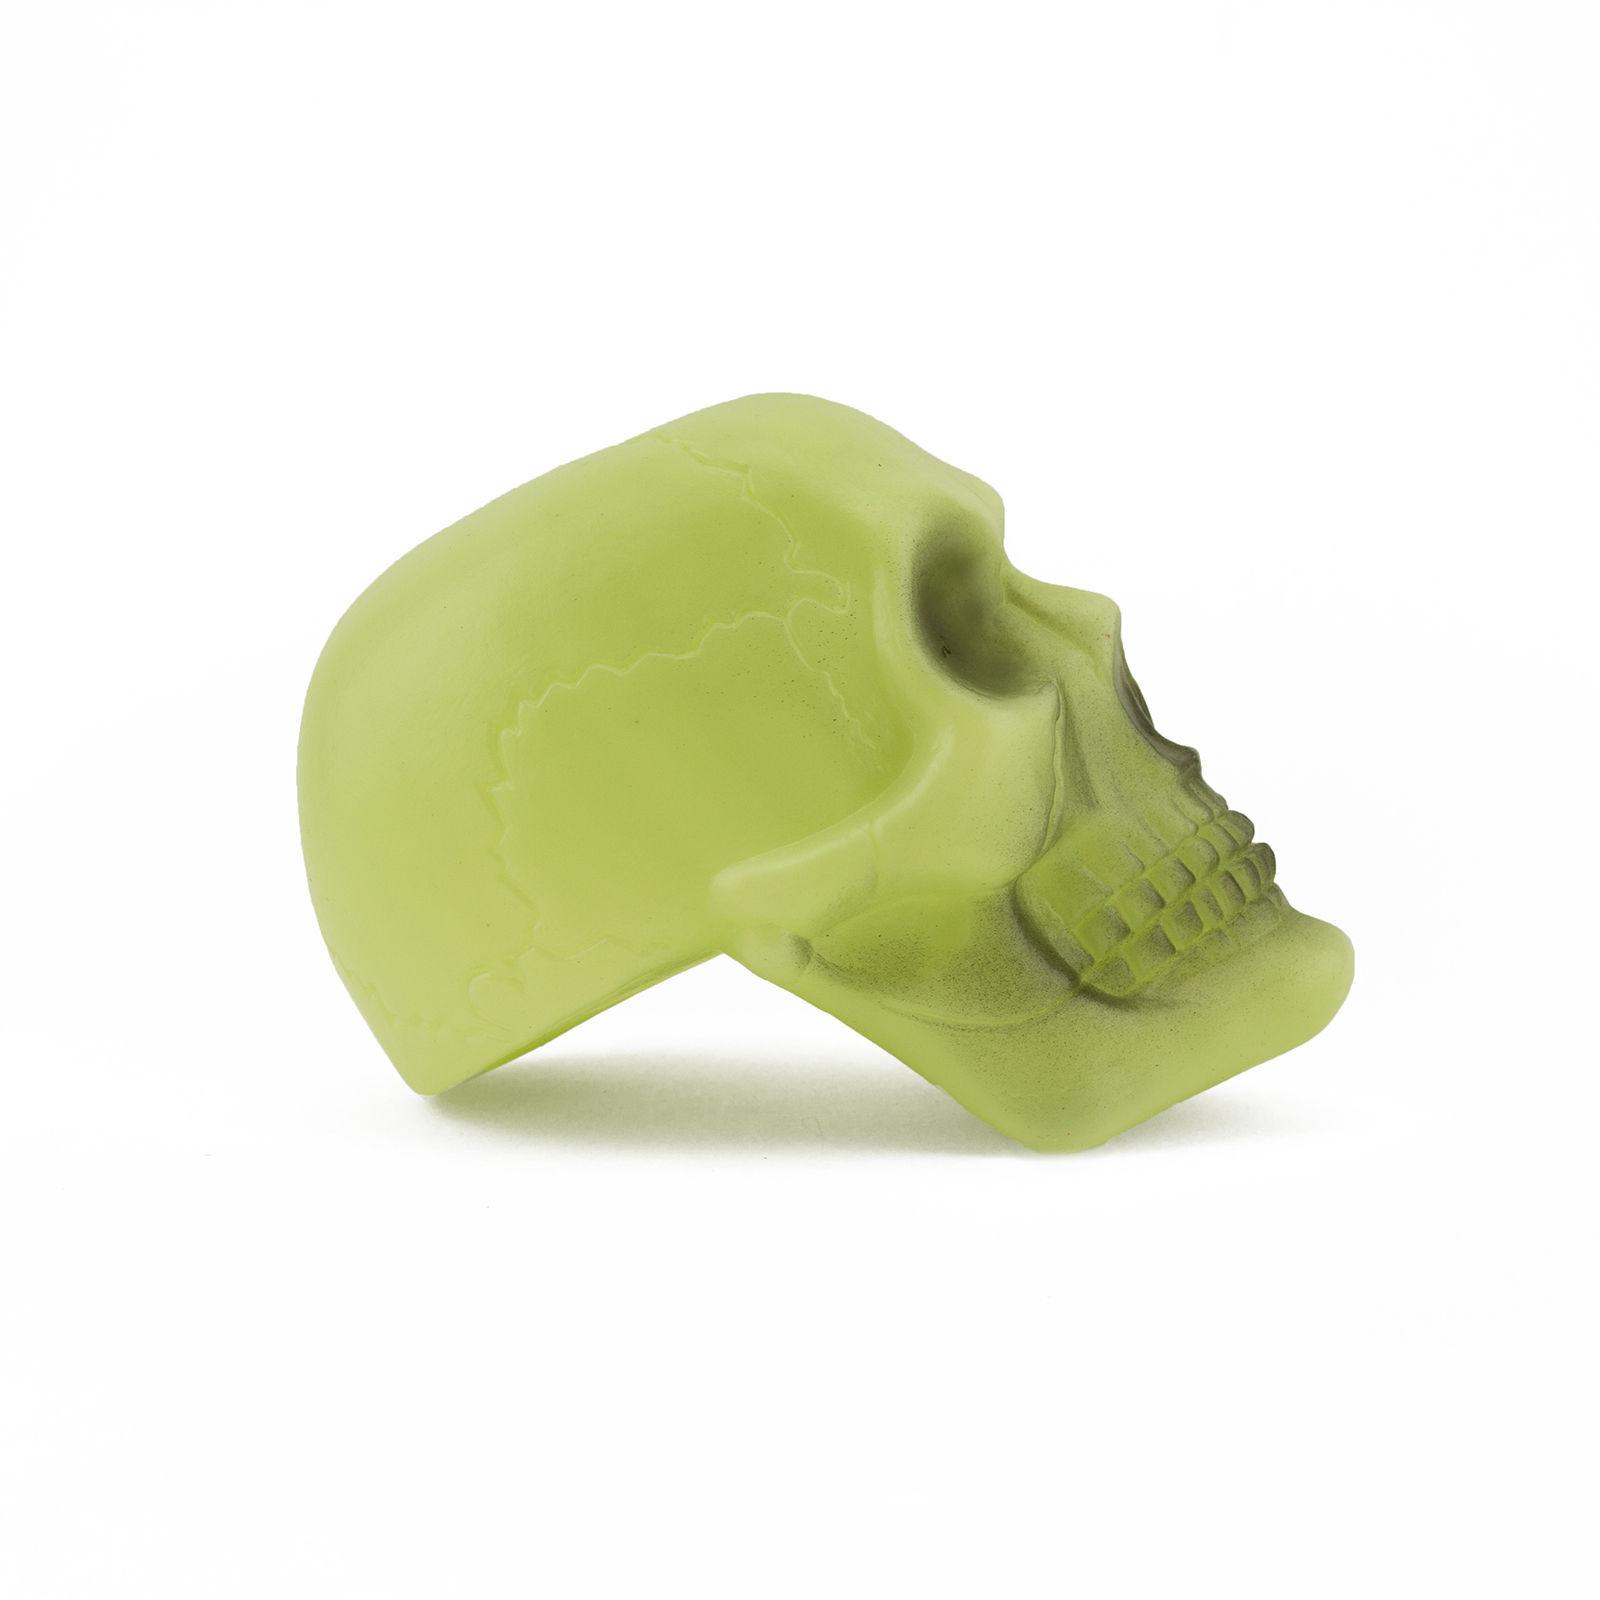 Plastic Glow in the Dark Skull and Cross Bones Halloween Skeleton Decoration Set